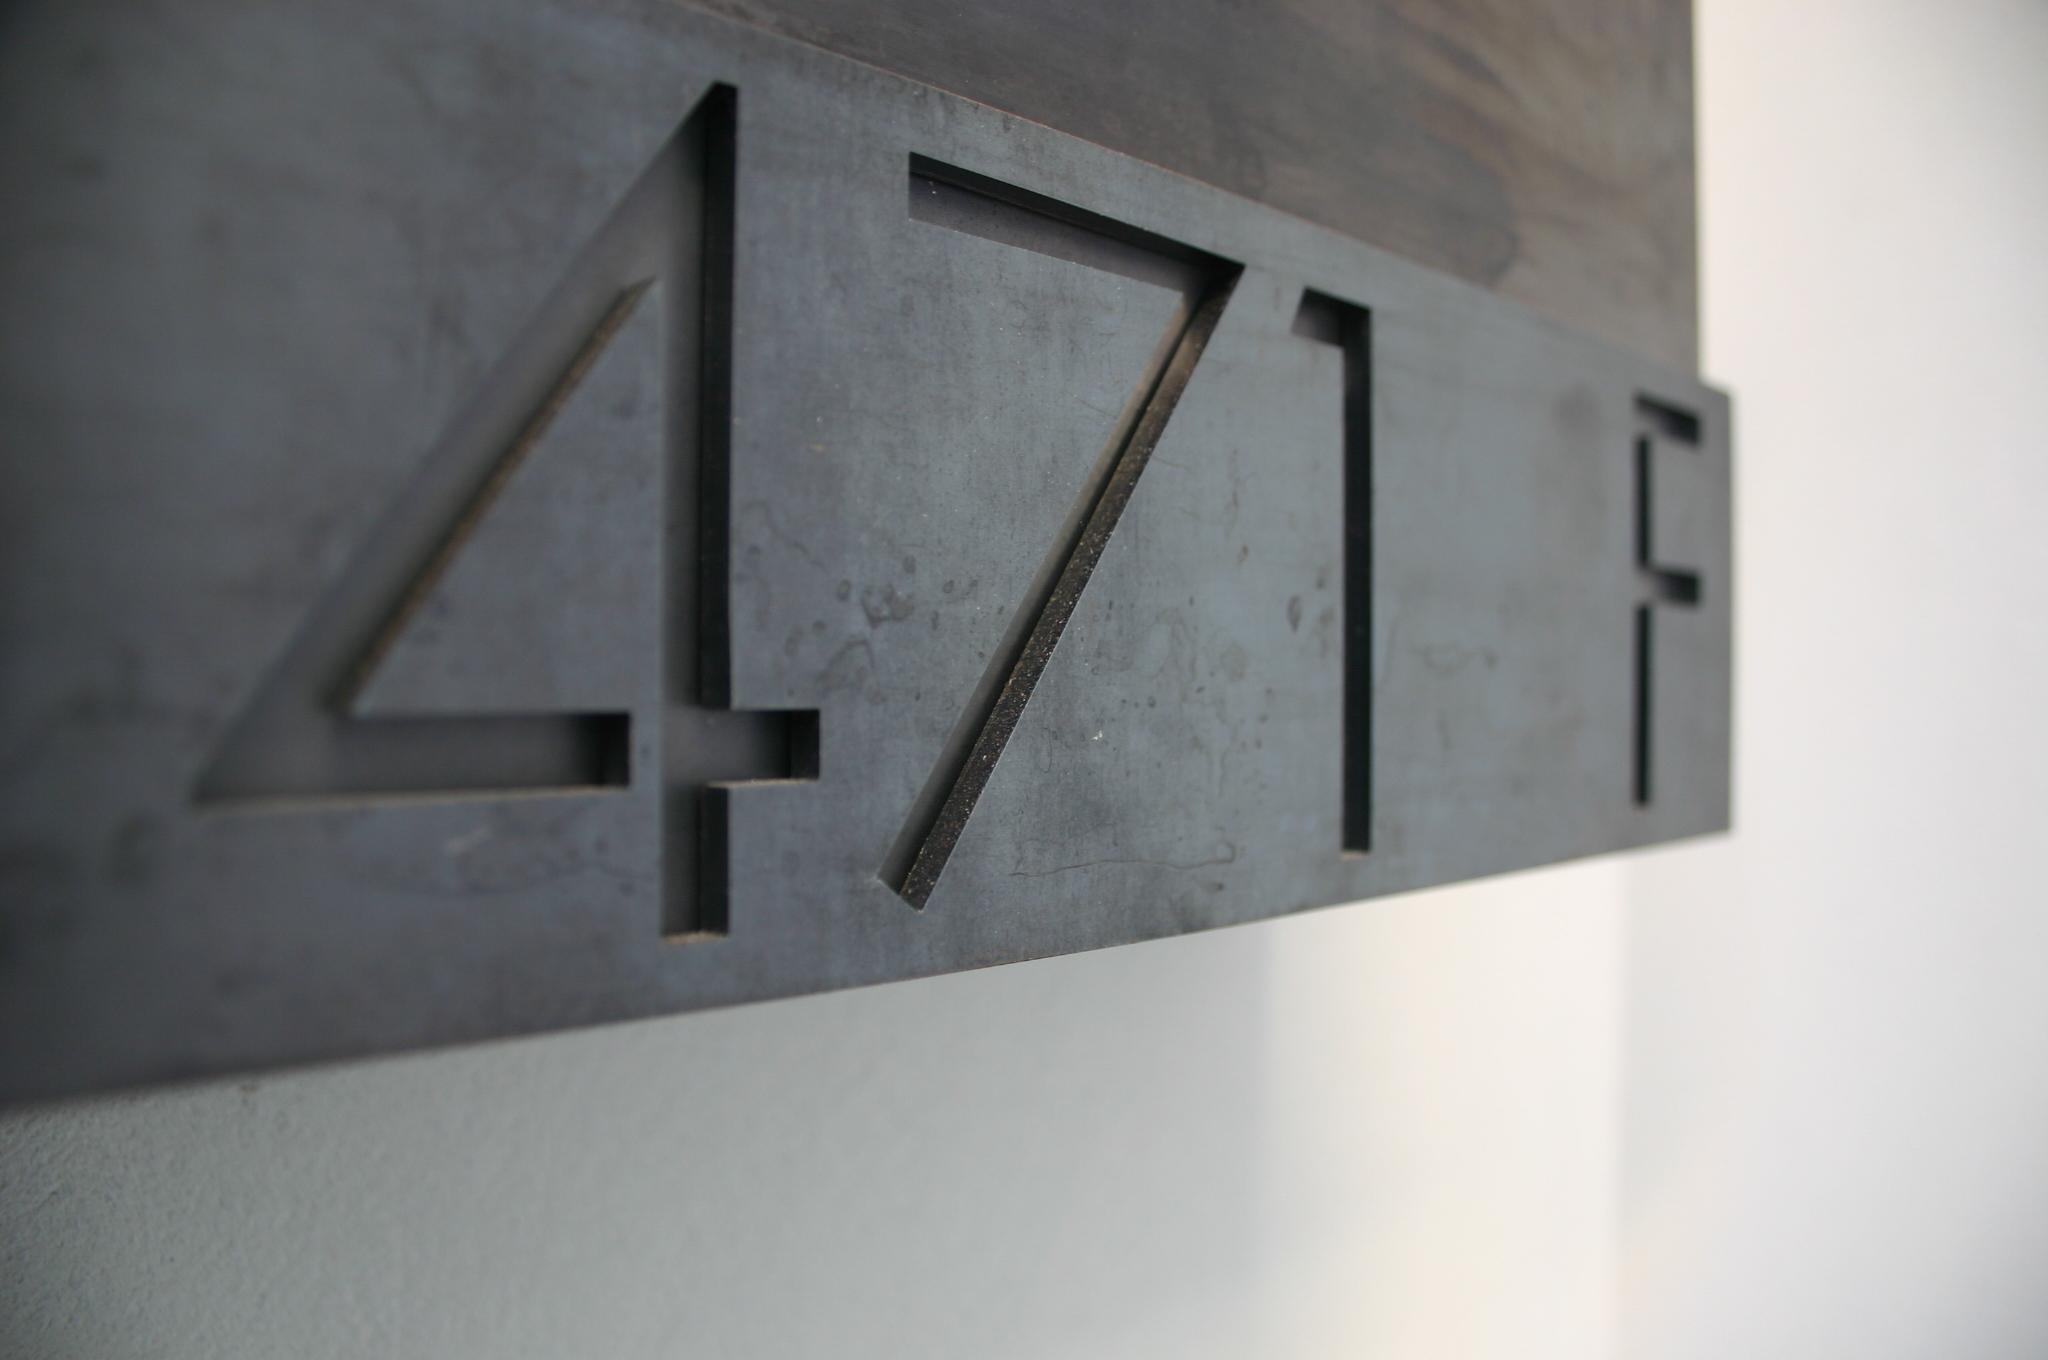 gl6_f27.JPG